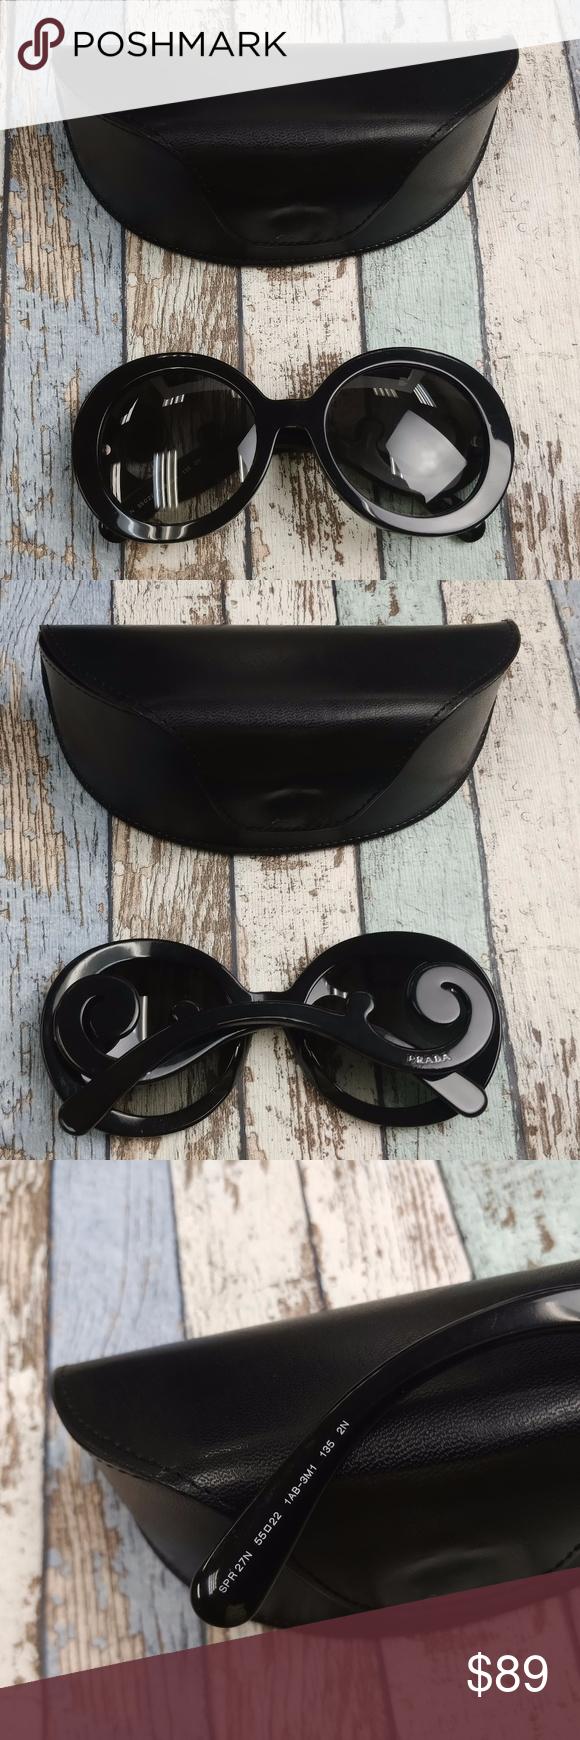 b017dadb83367 Prada SPR27N Women s Sunglasses  EUG539 Made in Italy! Lens Condition   Almost